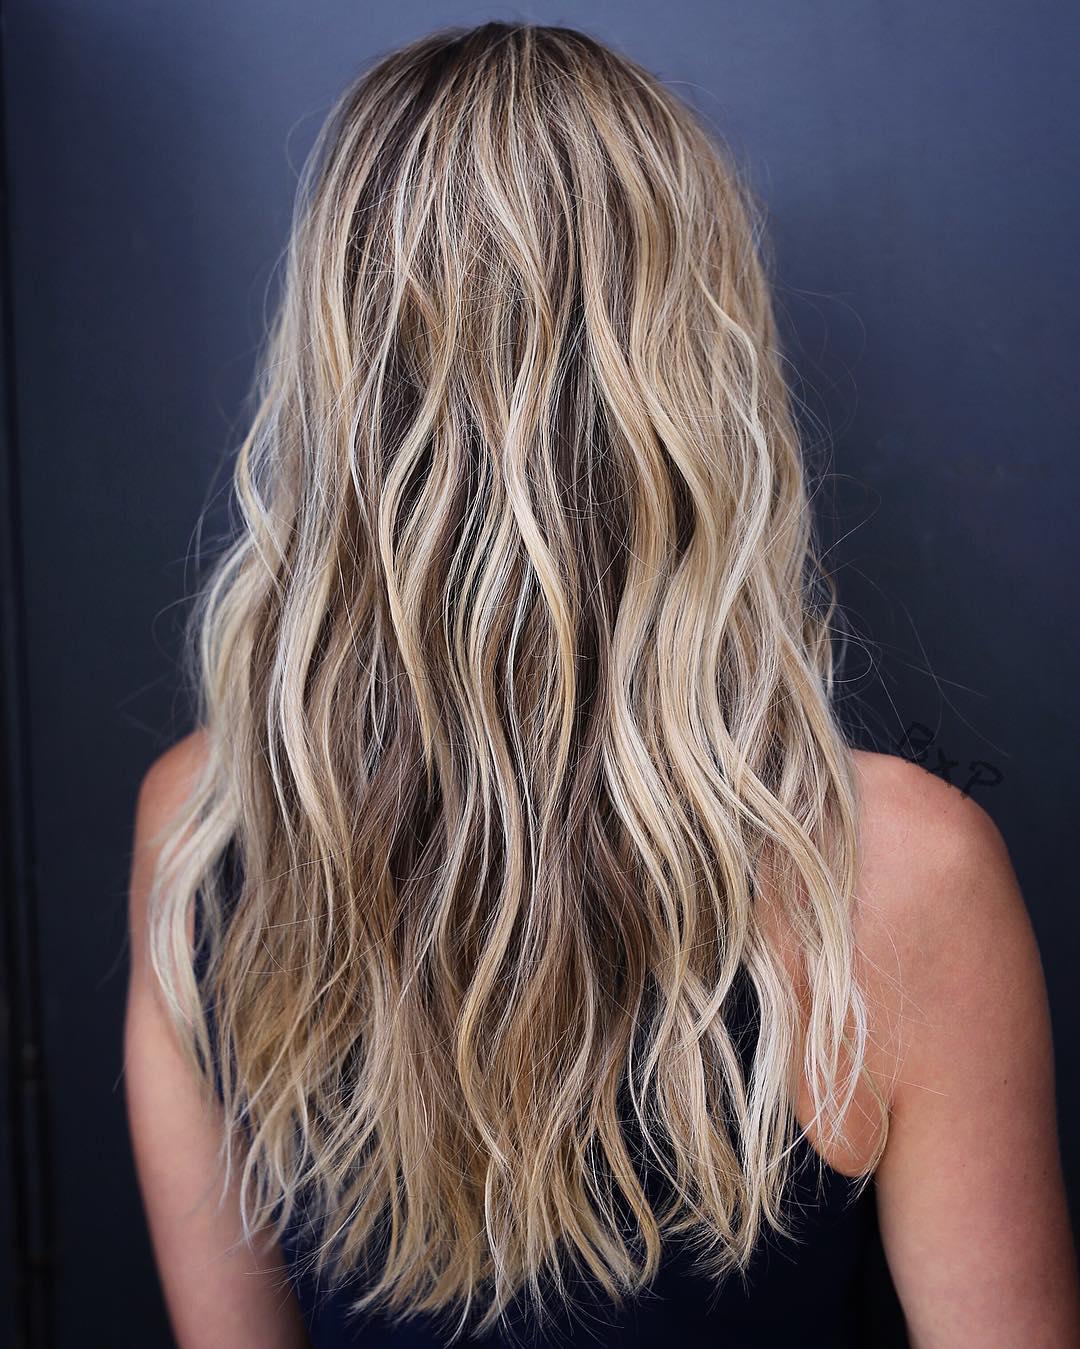 balayage ombre hair color ideas 10 10 Amazing Ombré and Balayage Hair Color Ideas